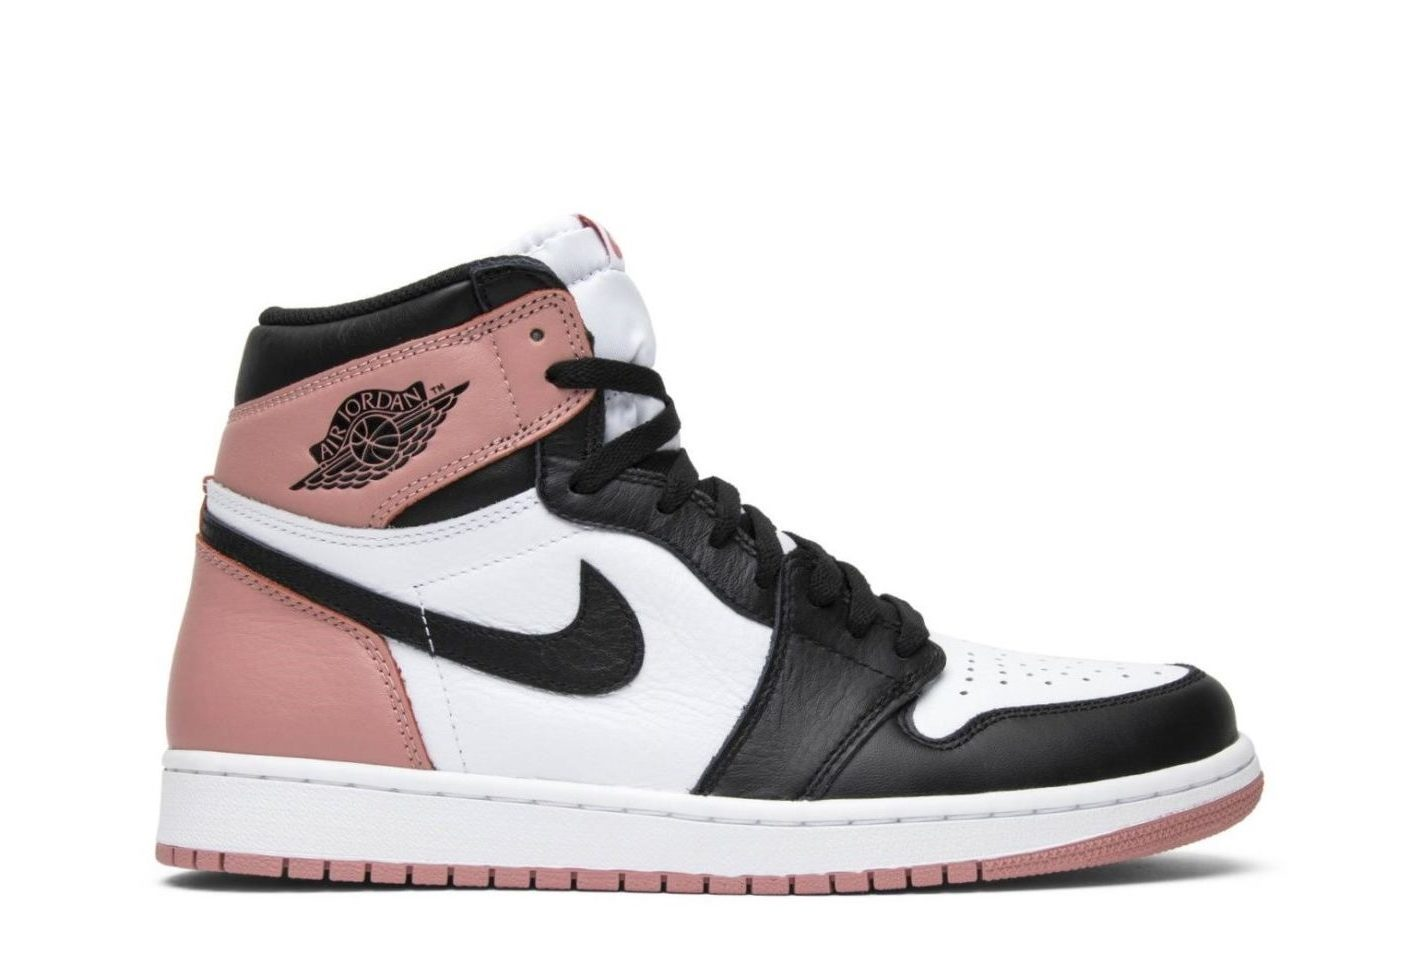 Krossovki-Air-Jordan-1-NRG-Rust-Pink-scaled-e1630238352296